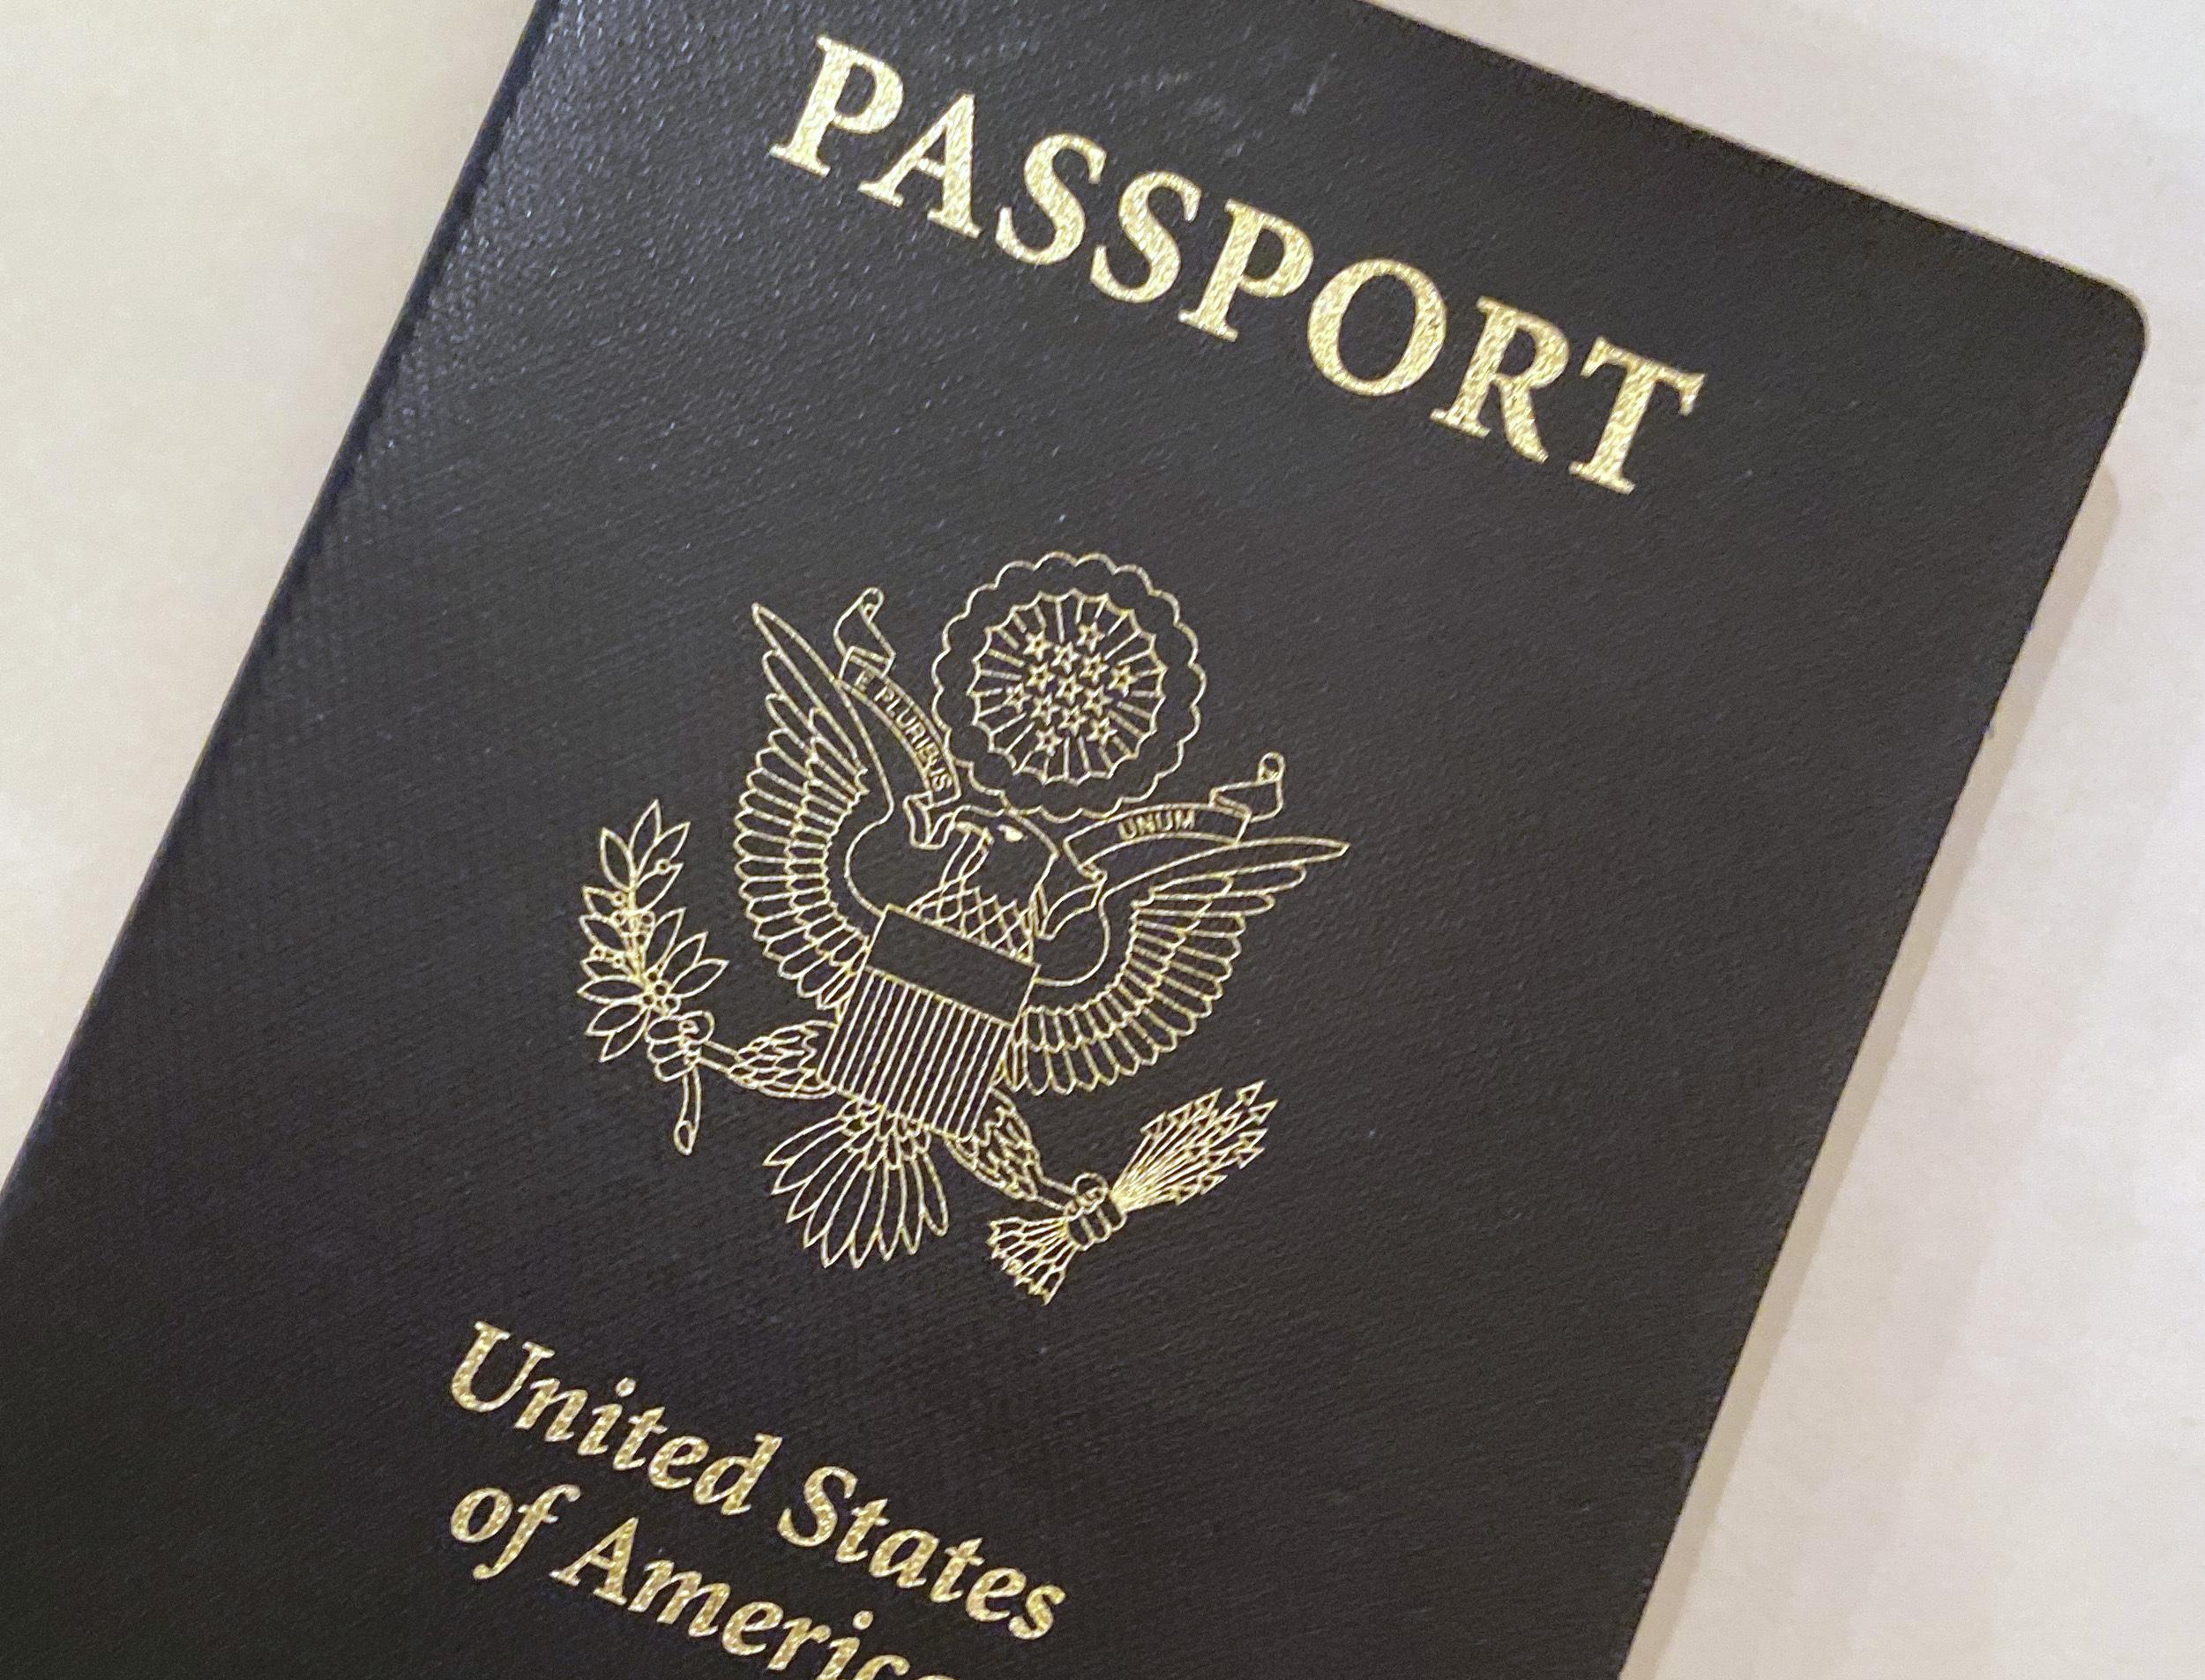 file photo shows a U.S. Passport cover in Washington.